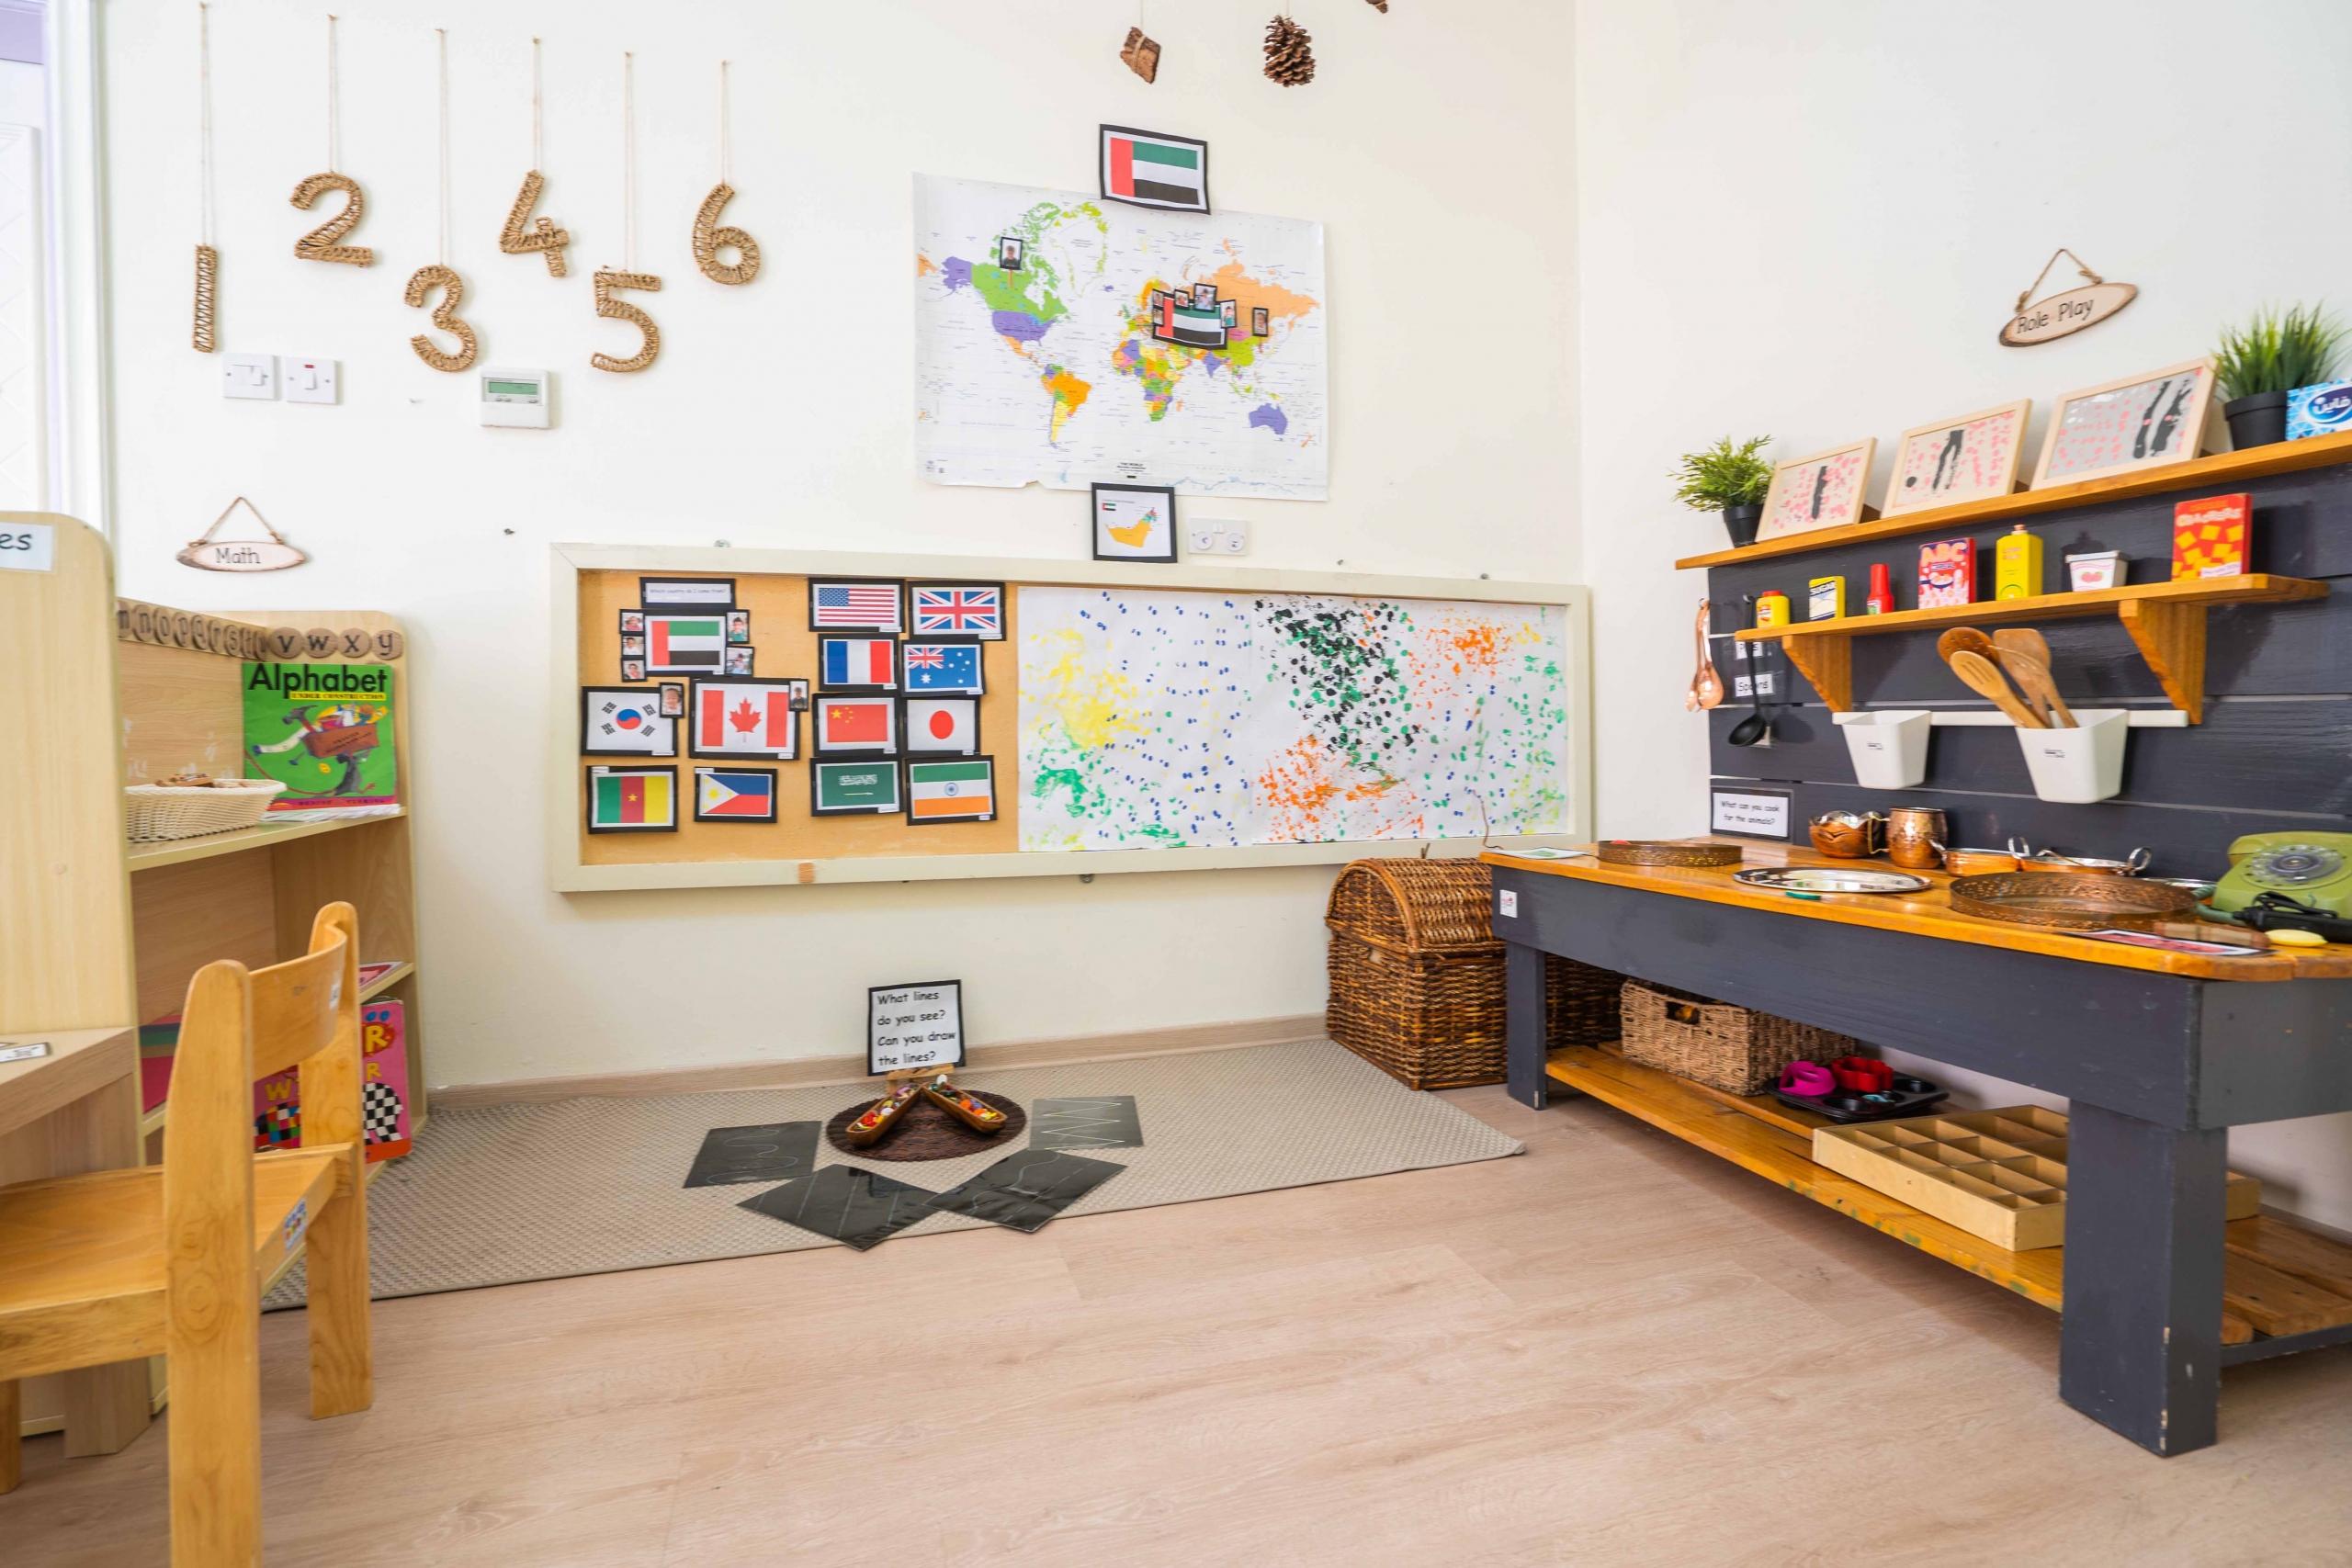 Khalifa classroom 5